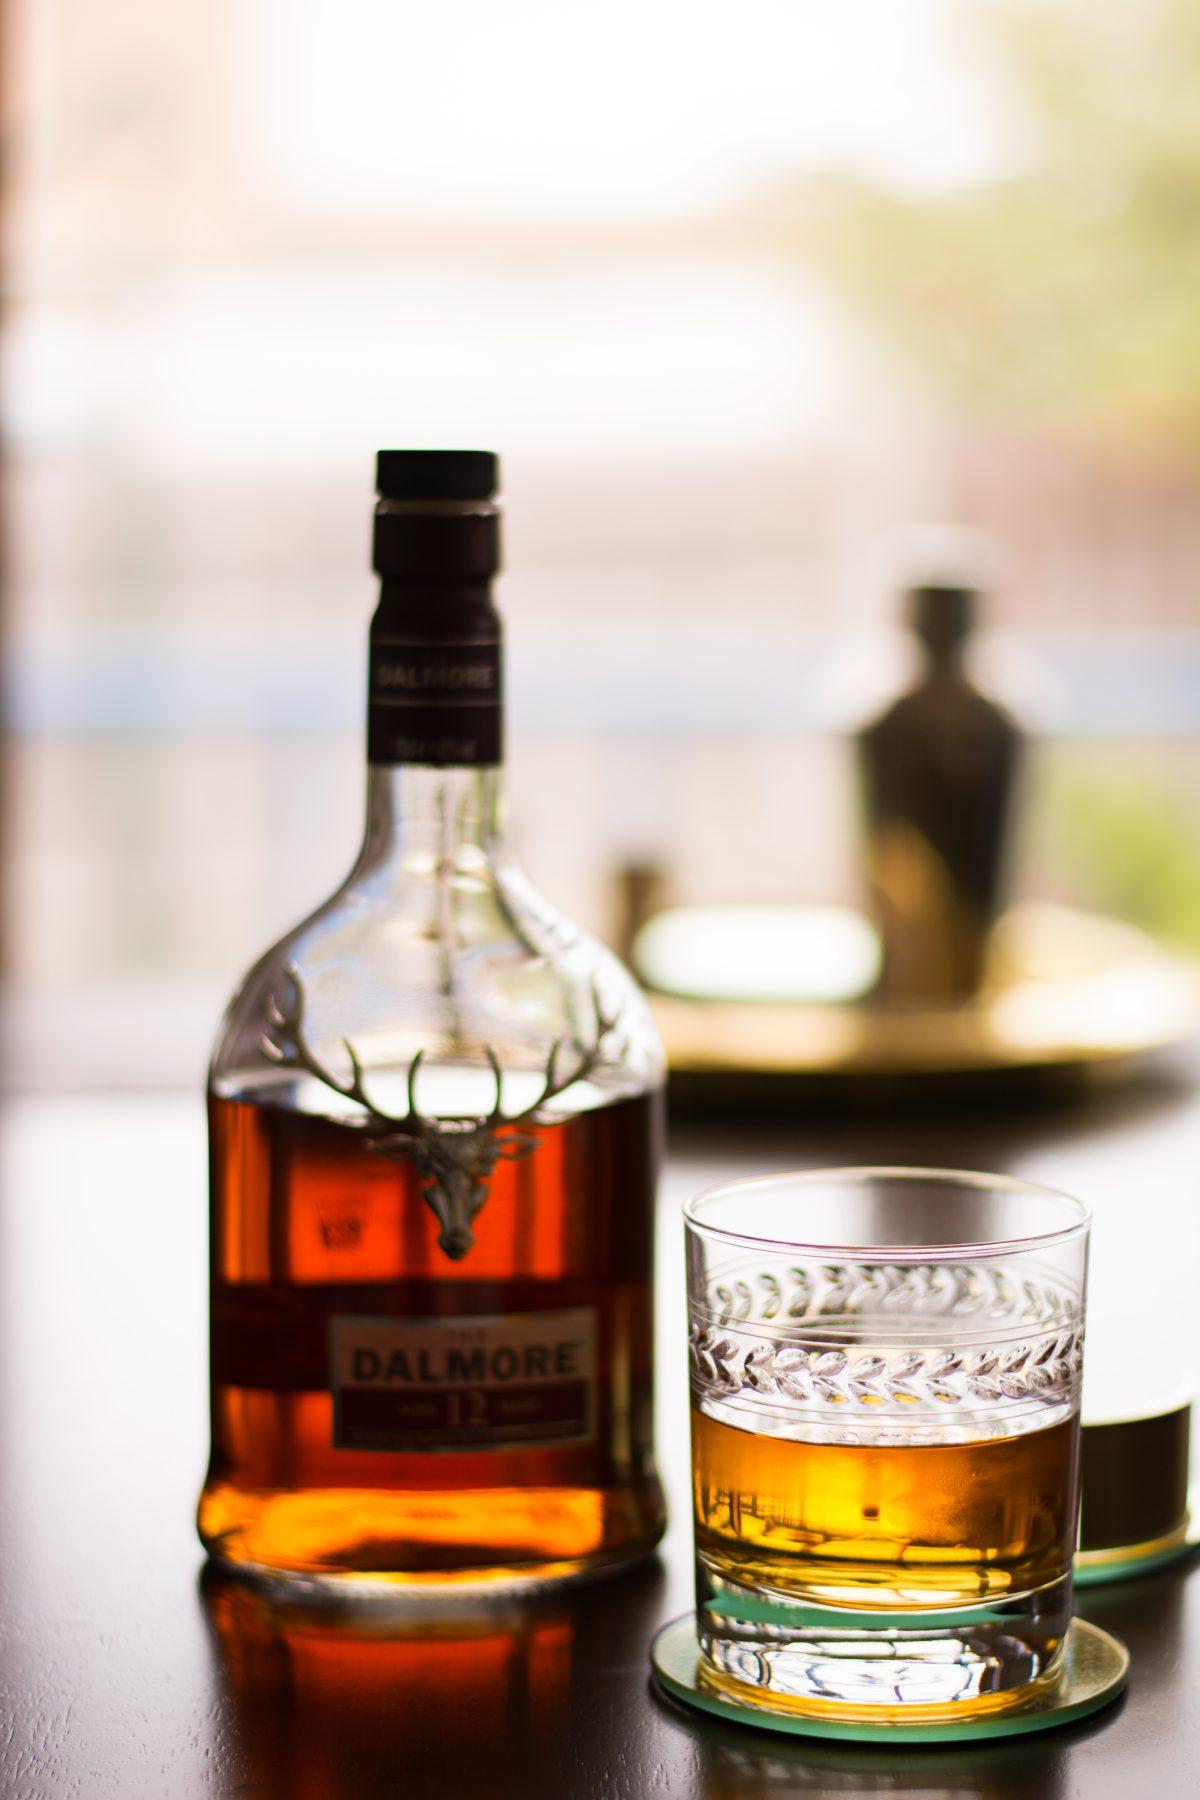 Dalmore single malt whisky - thespiceadventuress.com